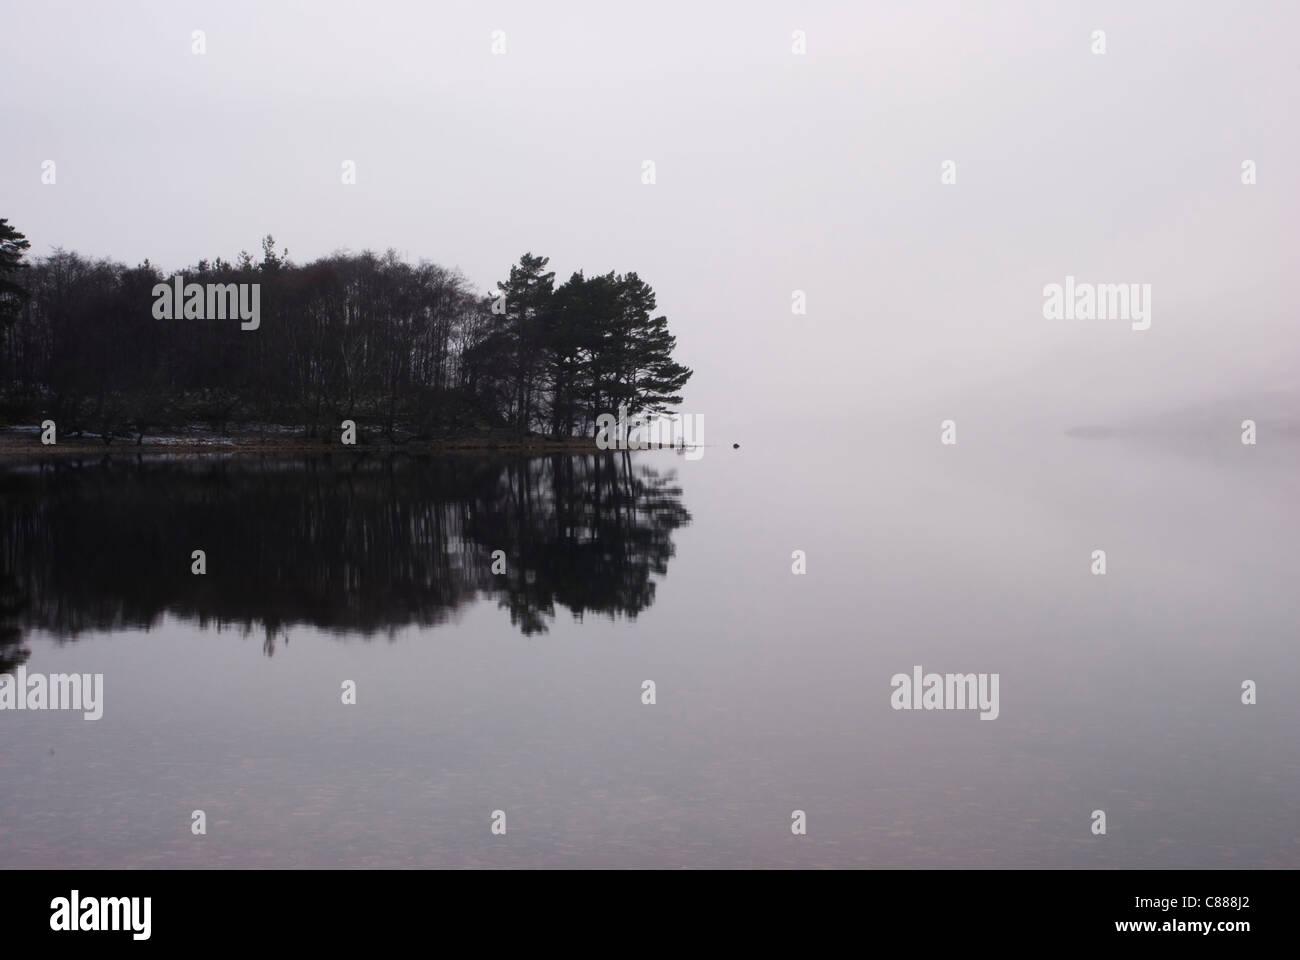 Loch Maree, Scotland - Stock Image